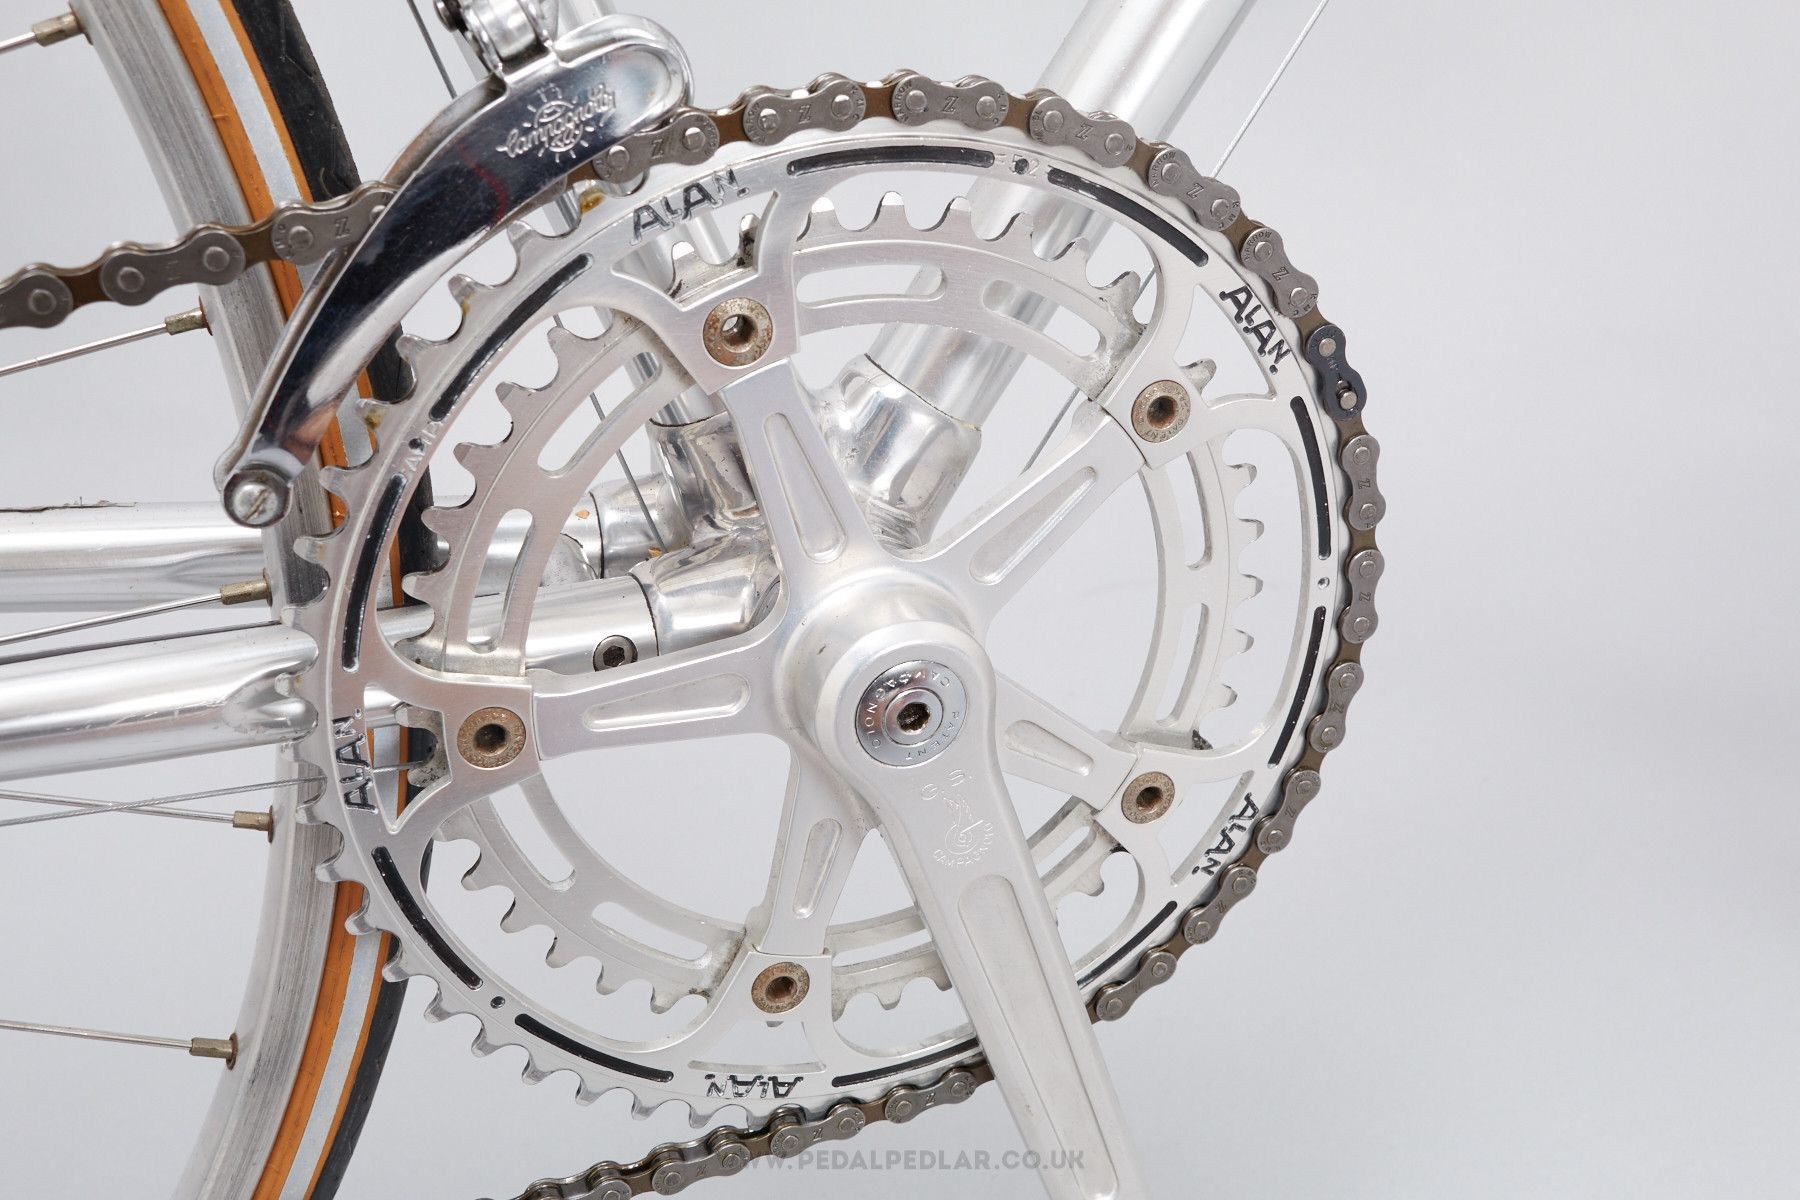 54cm Alan Vintage Road Racing Bike Pedal Pedlar 19 Road Racing Bike Road Racing Bike